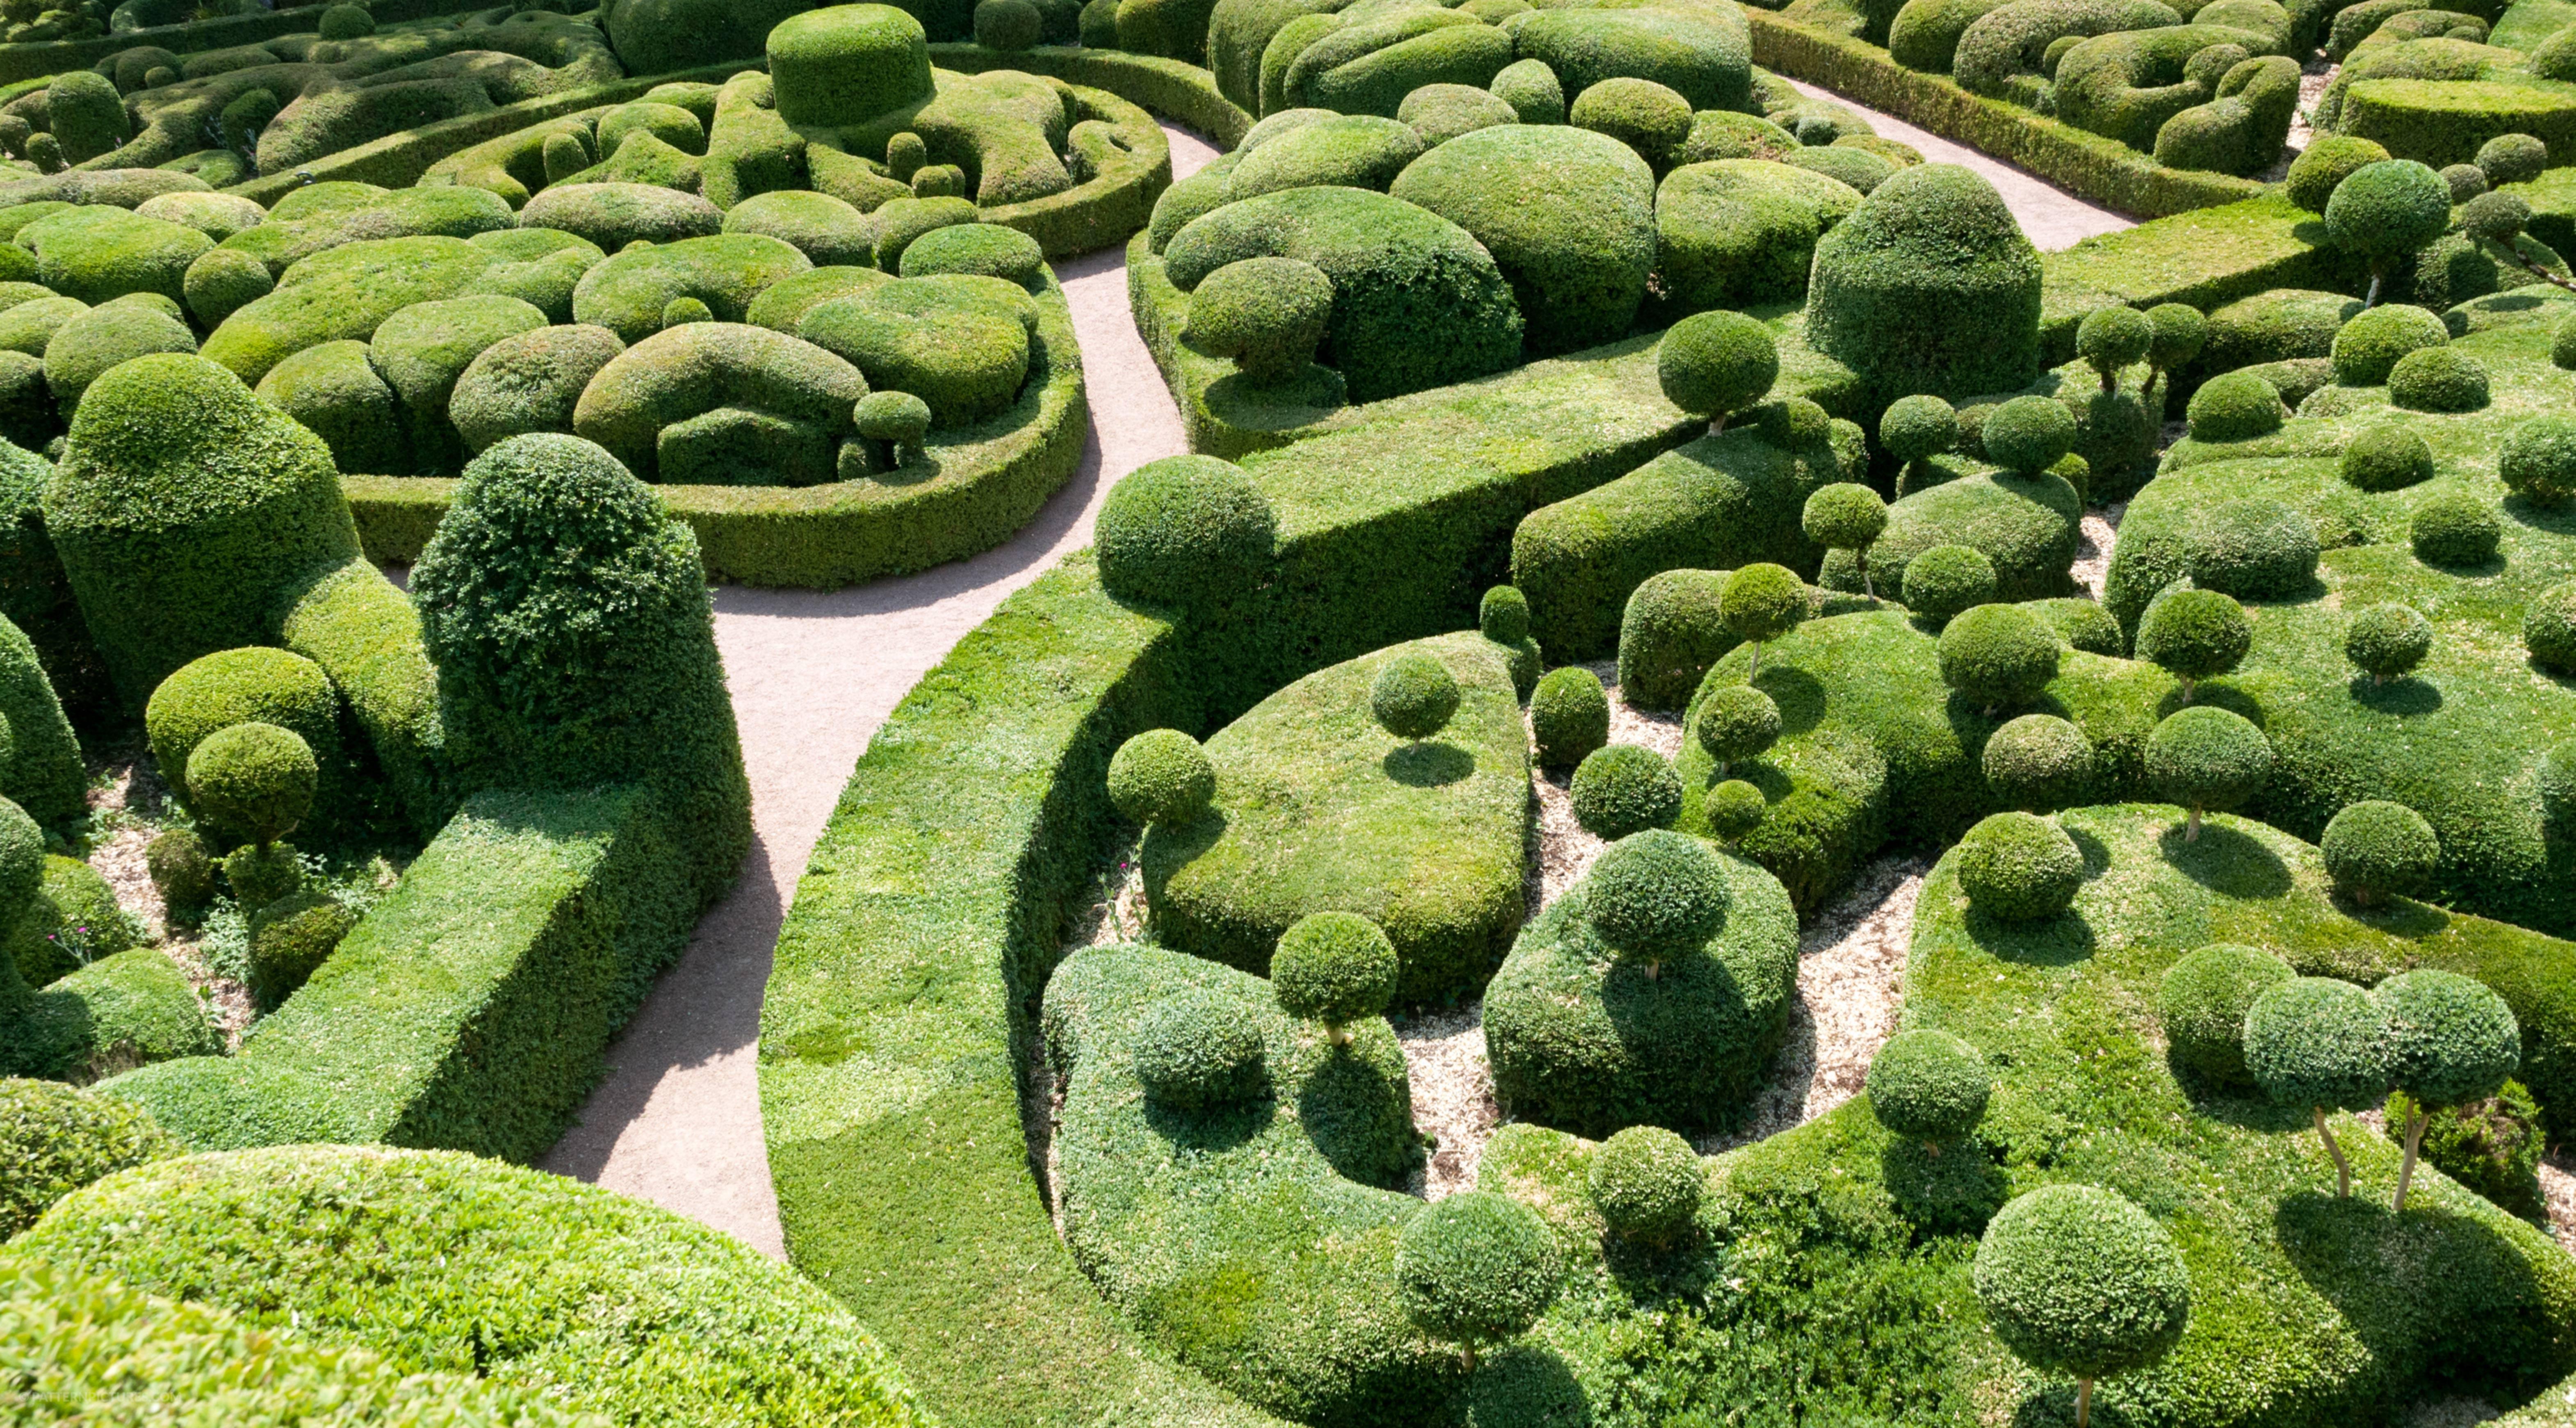 Beautifully arranged buxus garden